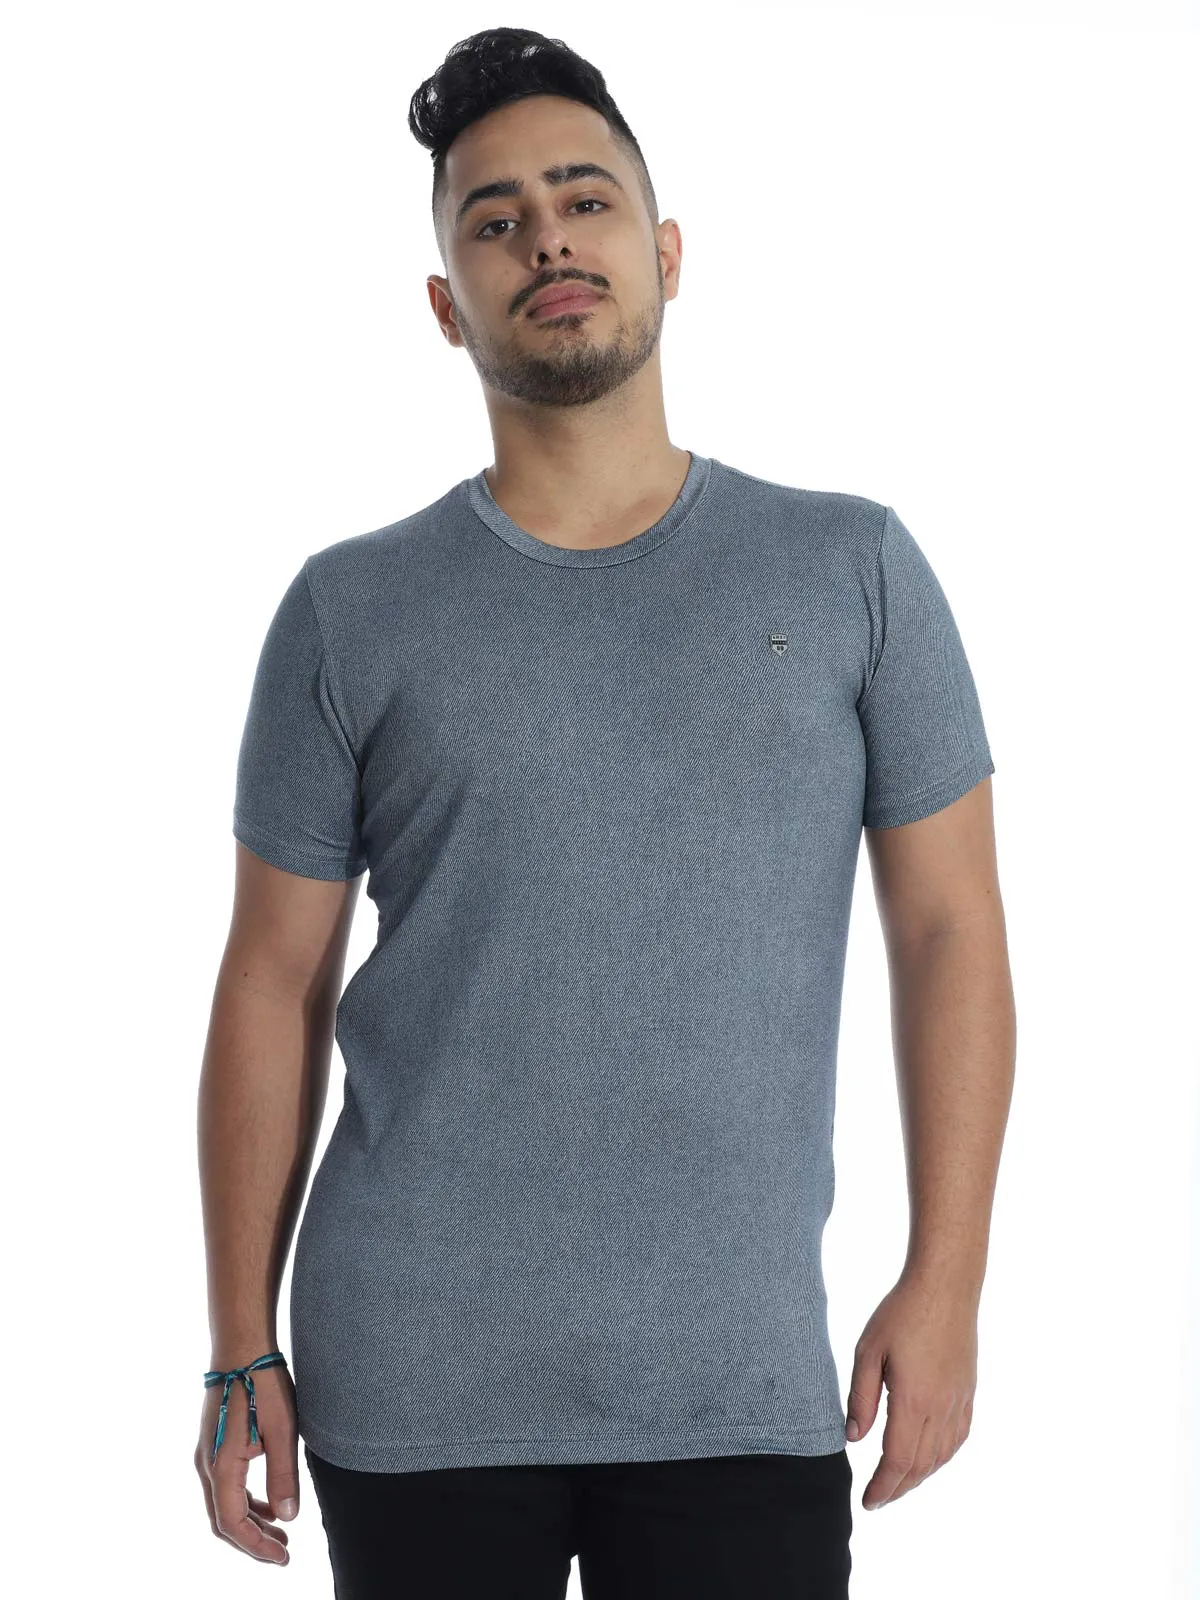 Camiseta Masculina Visco Slim Fit Manga Curta Jeans